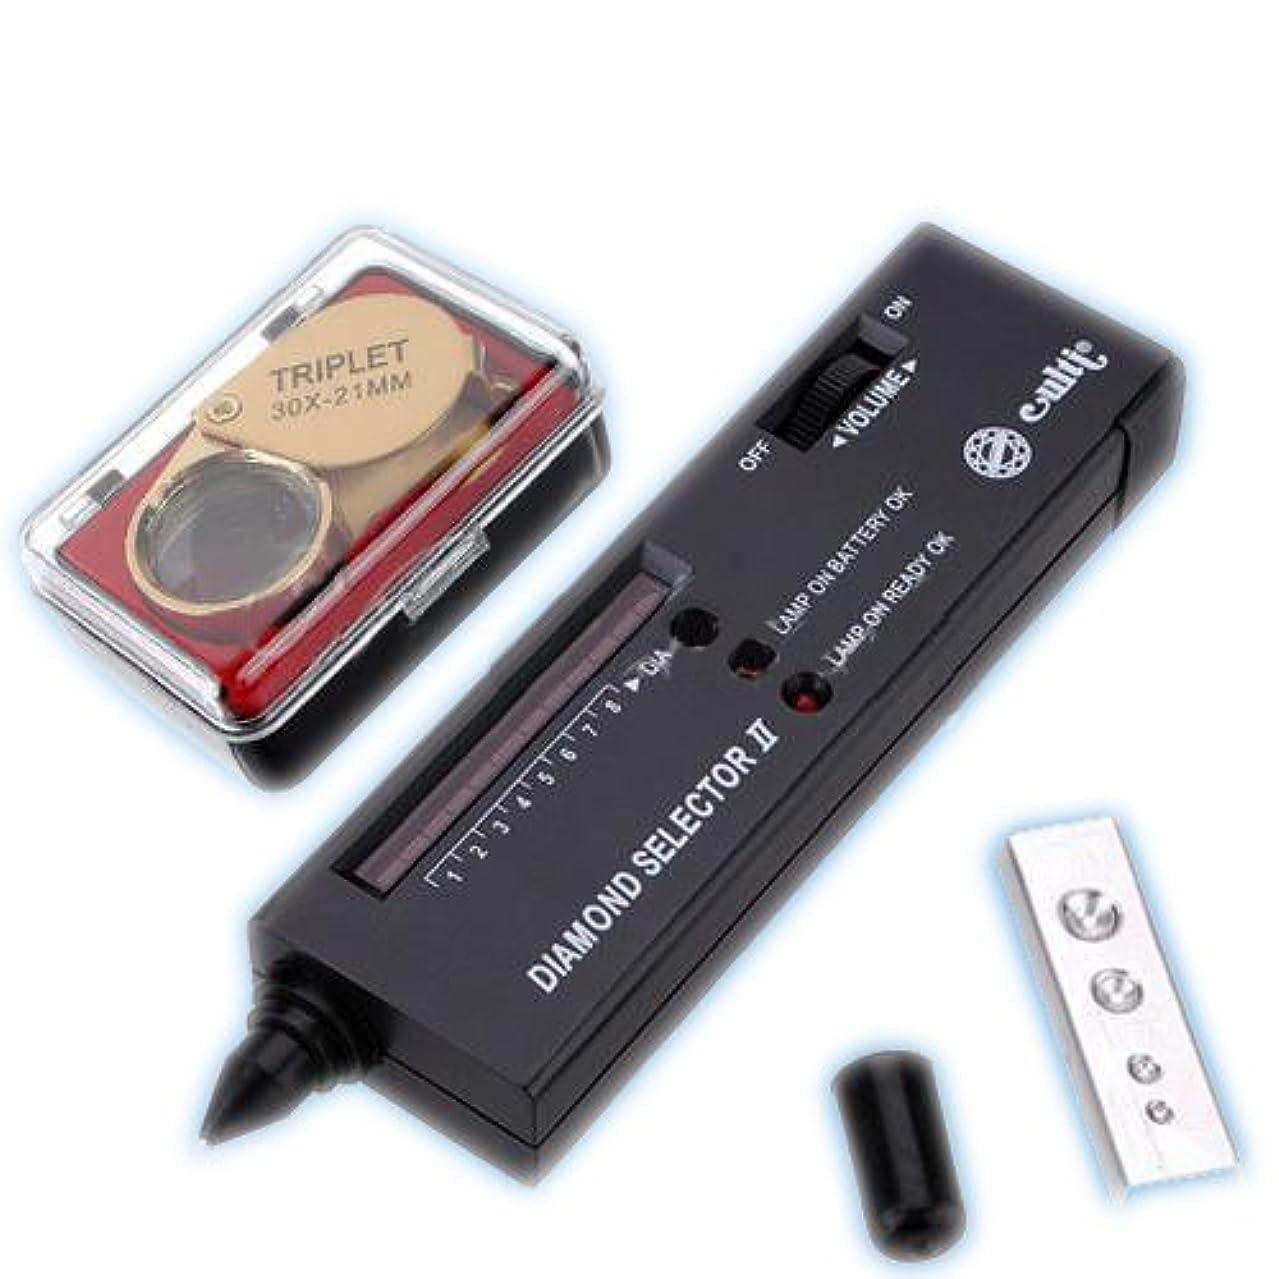 Portable Gemstone Gems Diamond Tester Selector II + 30X Magnifier Jeweler Loupe